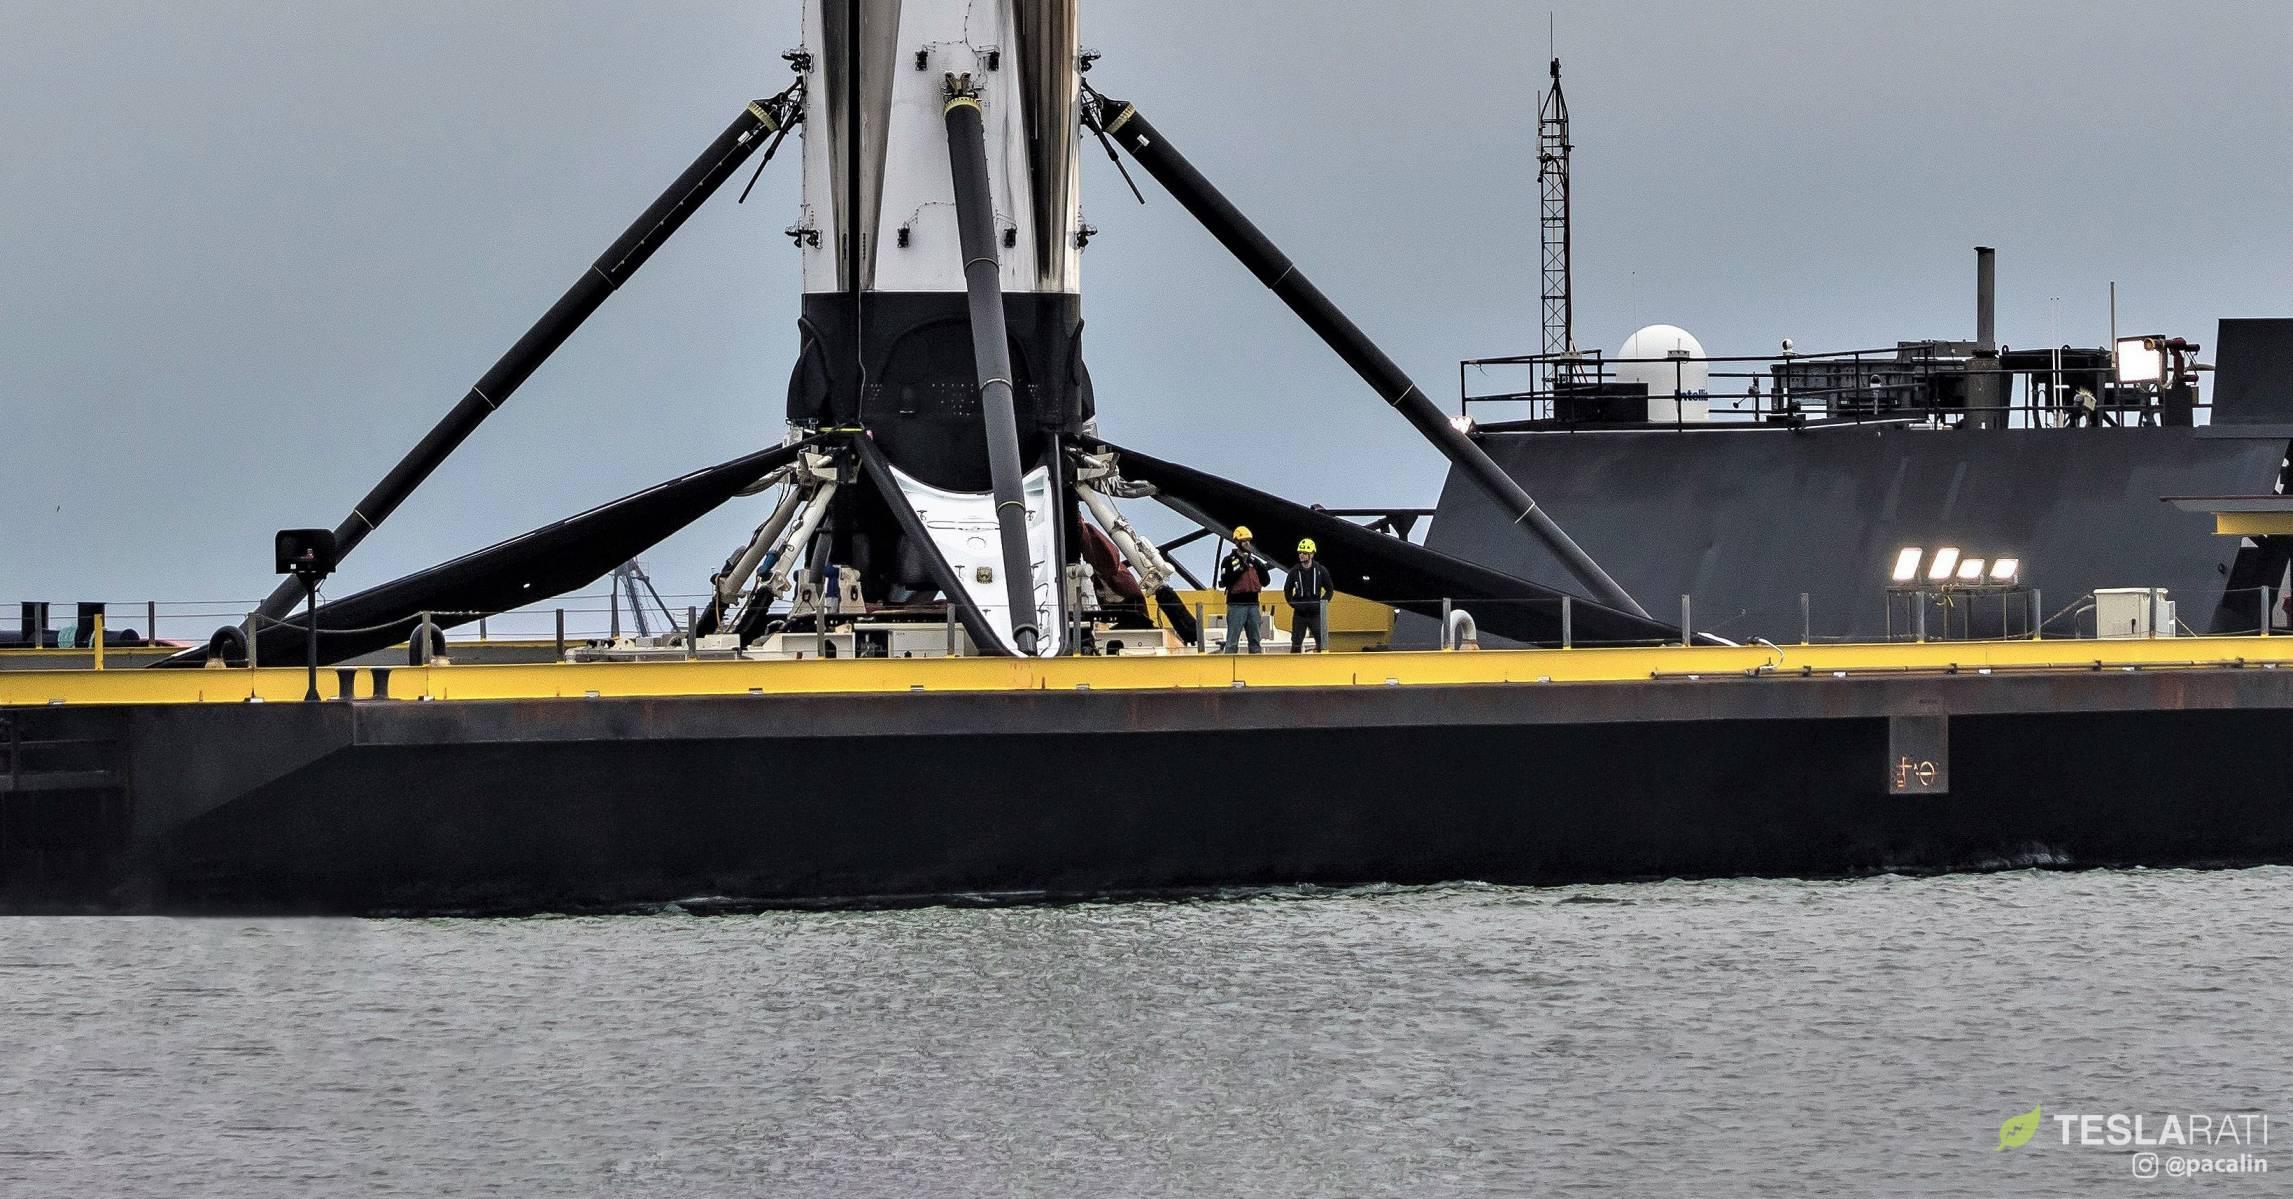 Falcon 9 B1051 DM-1 OCISLY recovery 030519 (Pauline Acalin) 12 crop 2 (c)